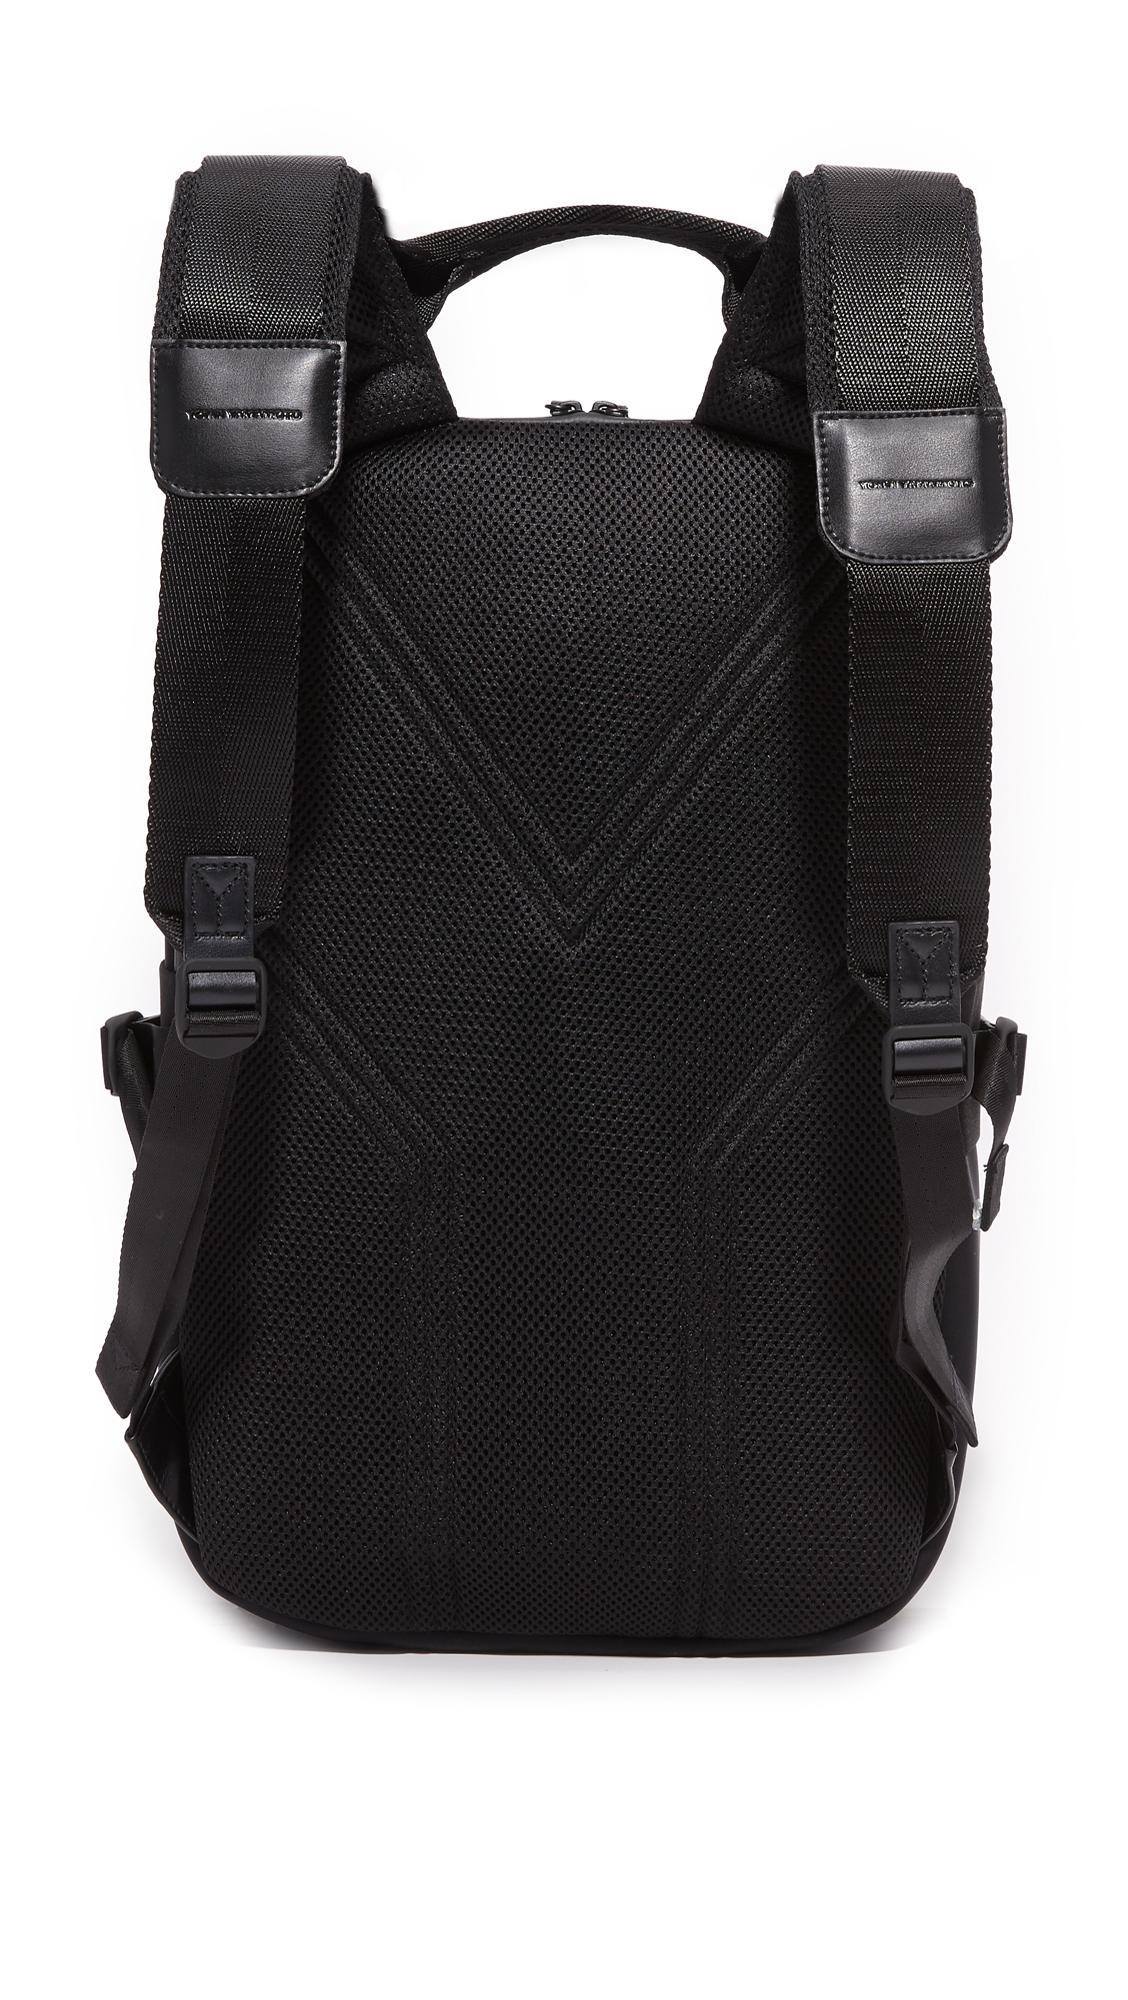 c05199d56e91 Y-3 Qasa Backpack